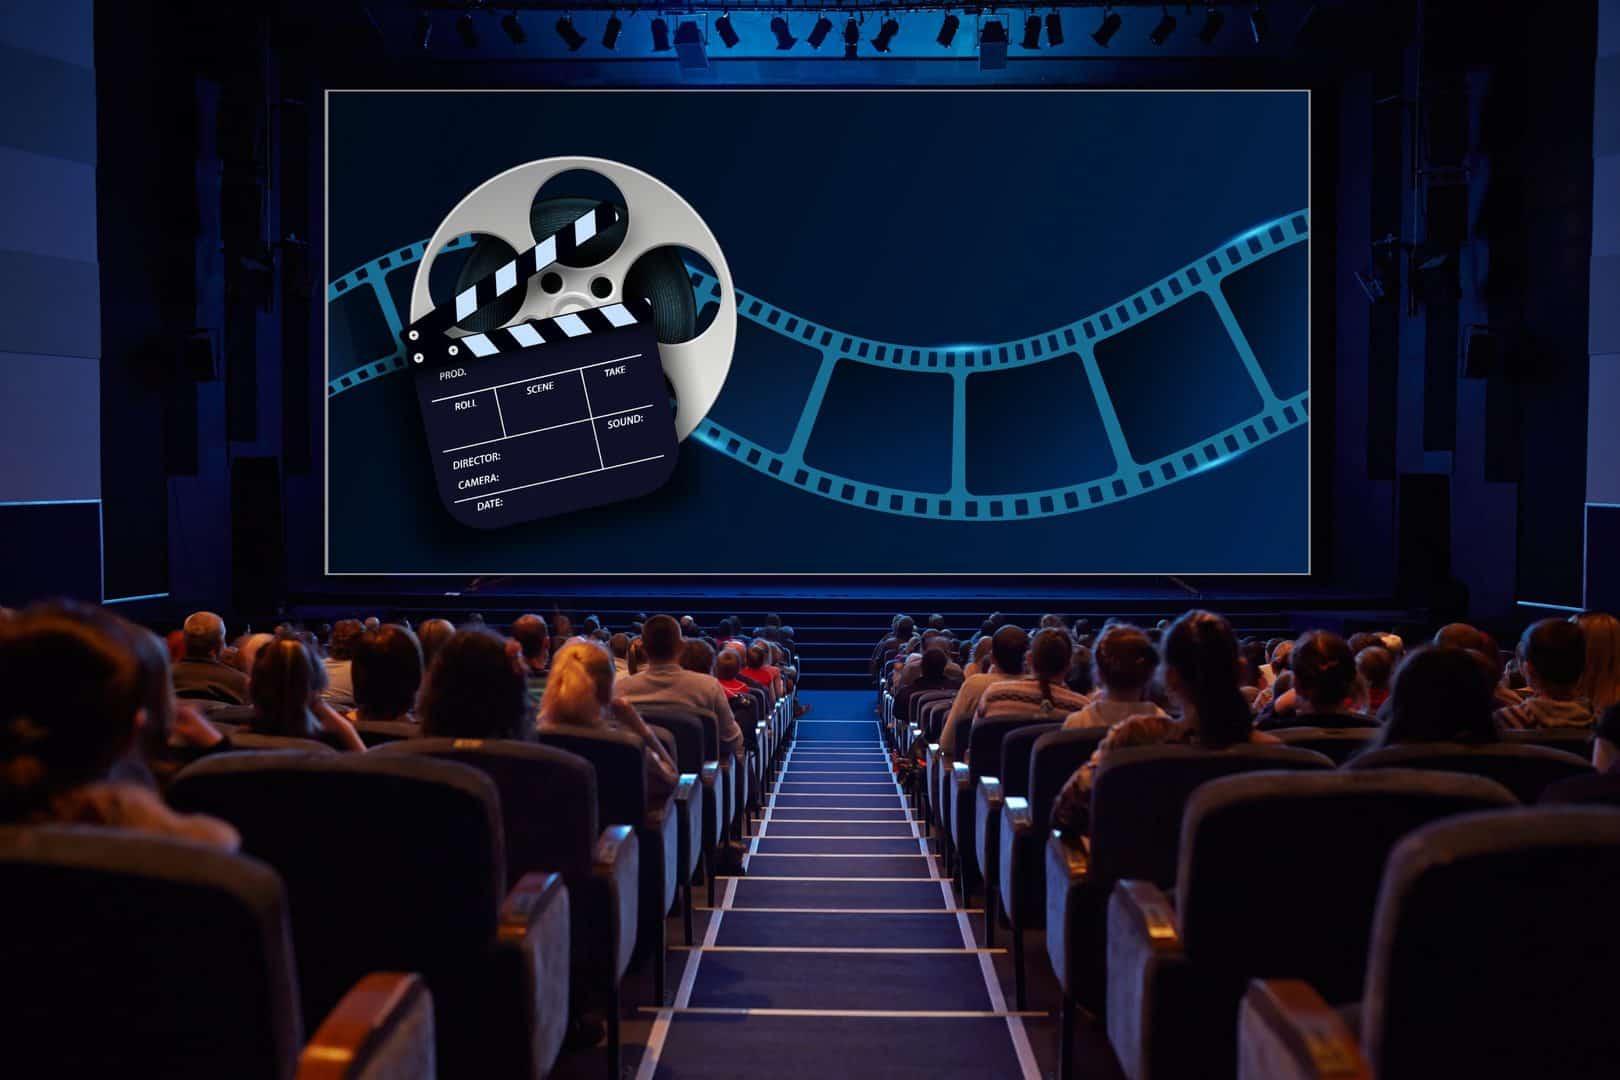 kino-multiplexe-ticket-international